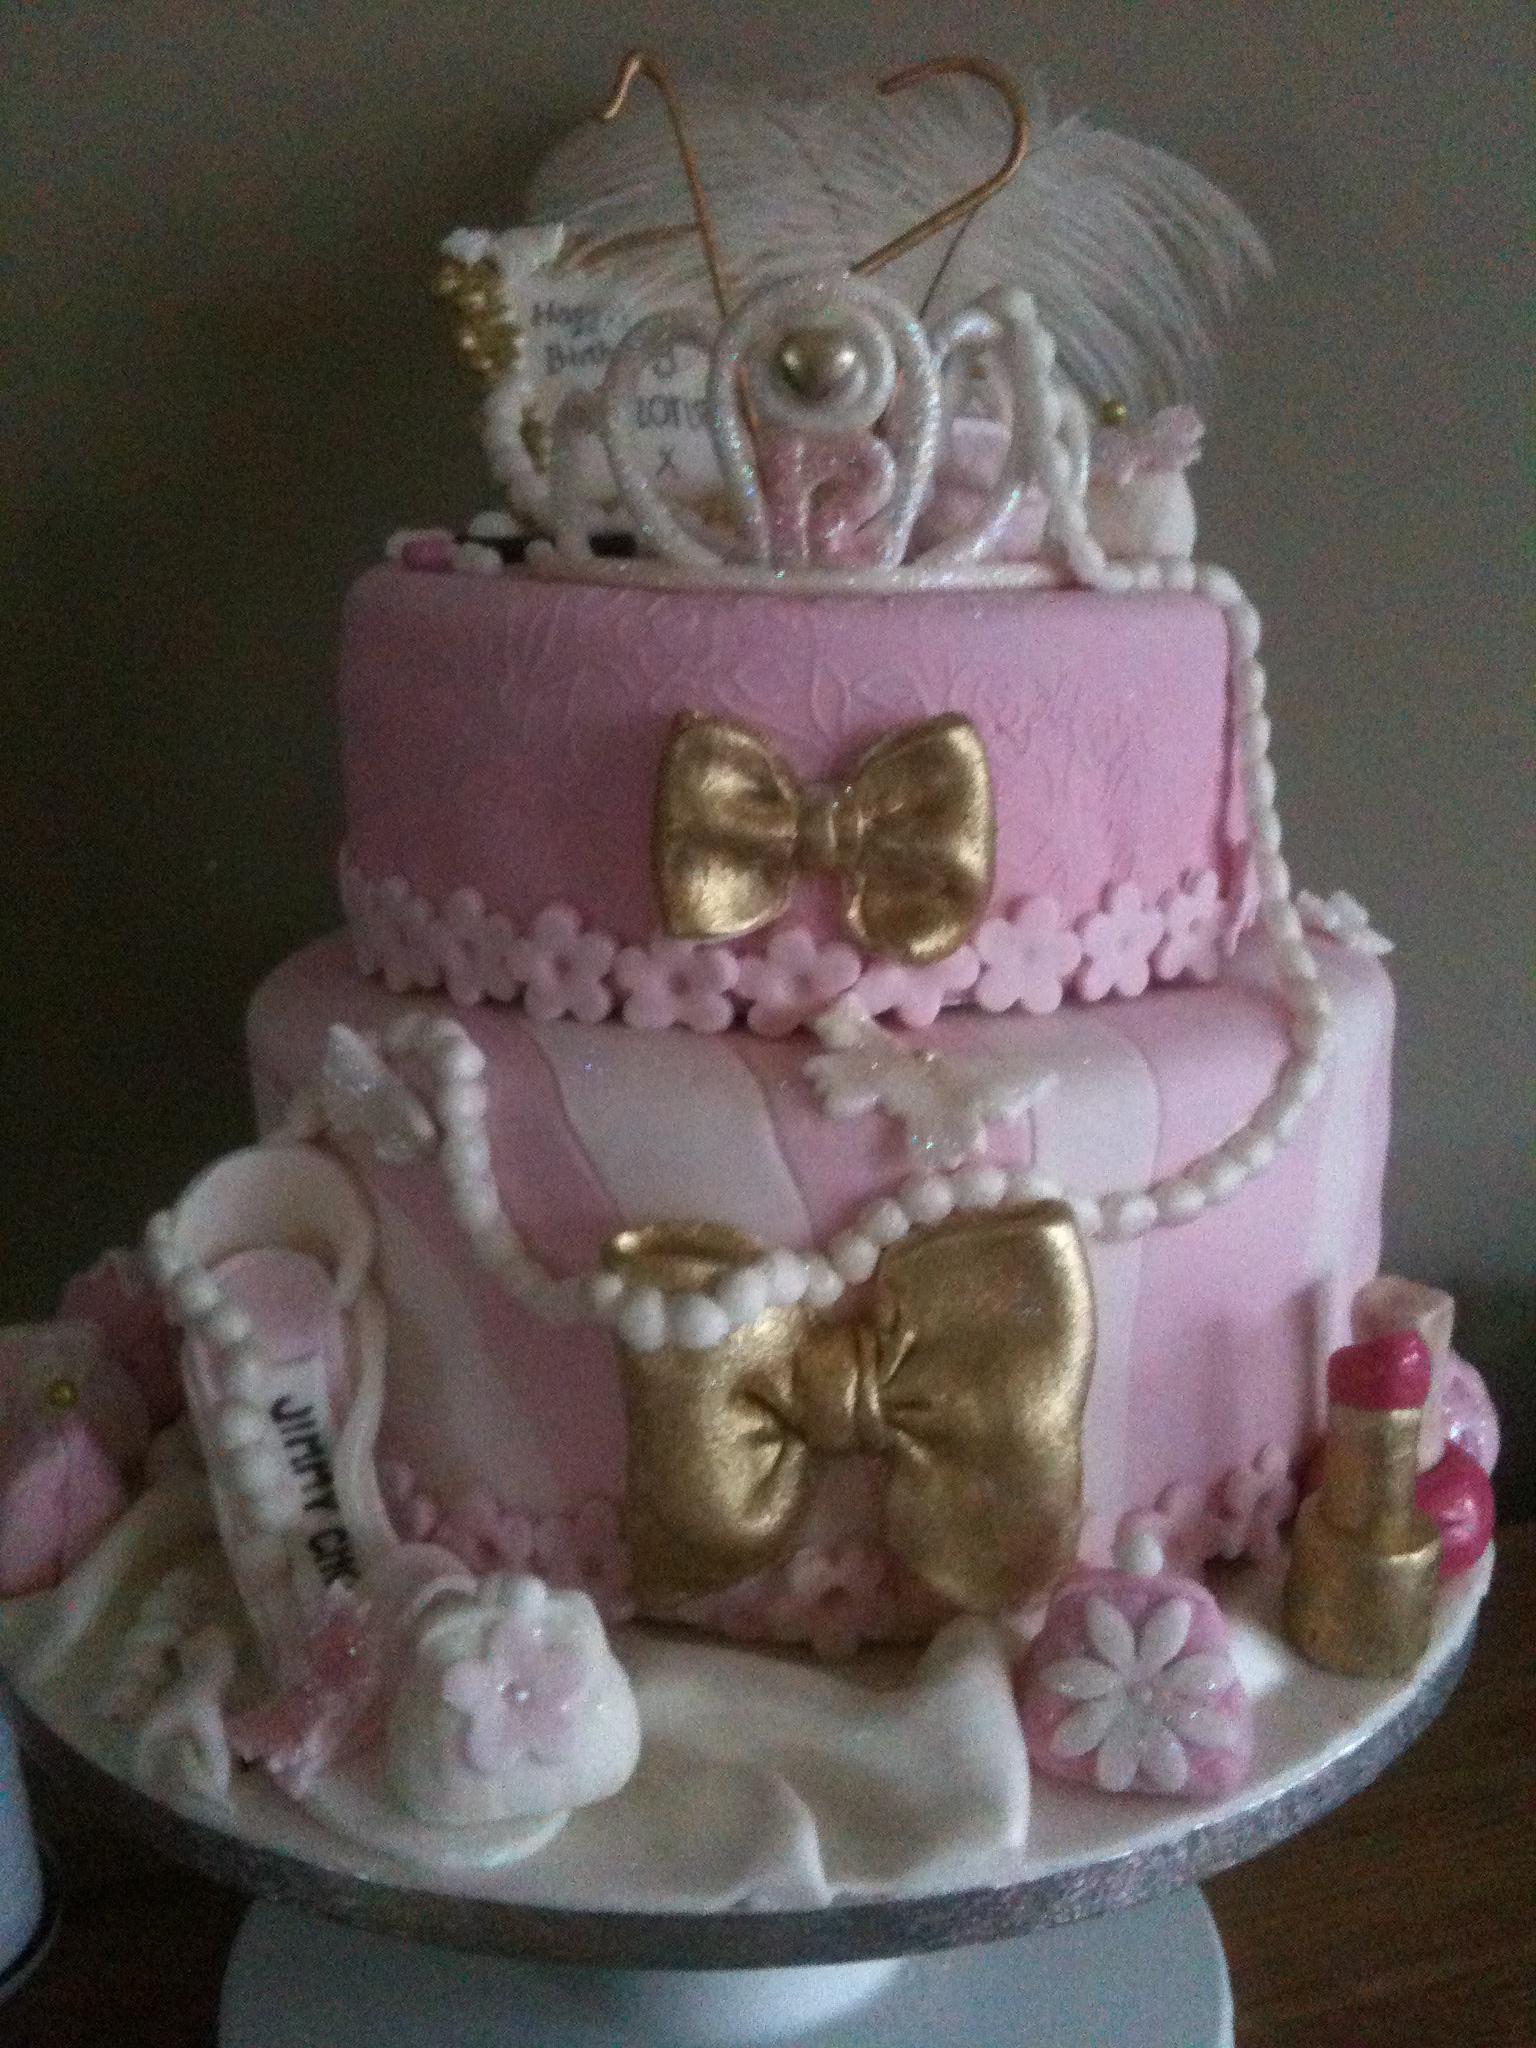 5 12 Year Old Birthday Ideas Cake And Cupcakes Photo Birthday